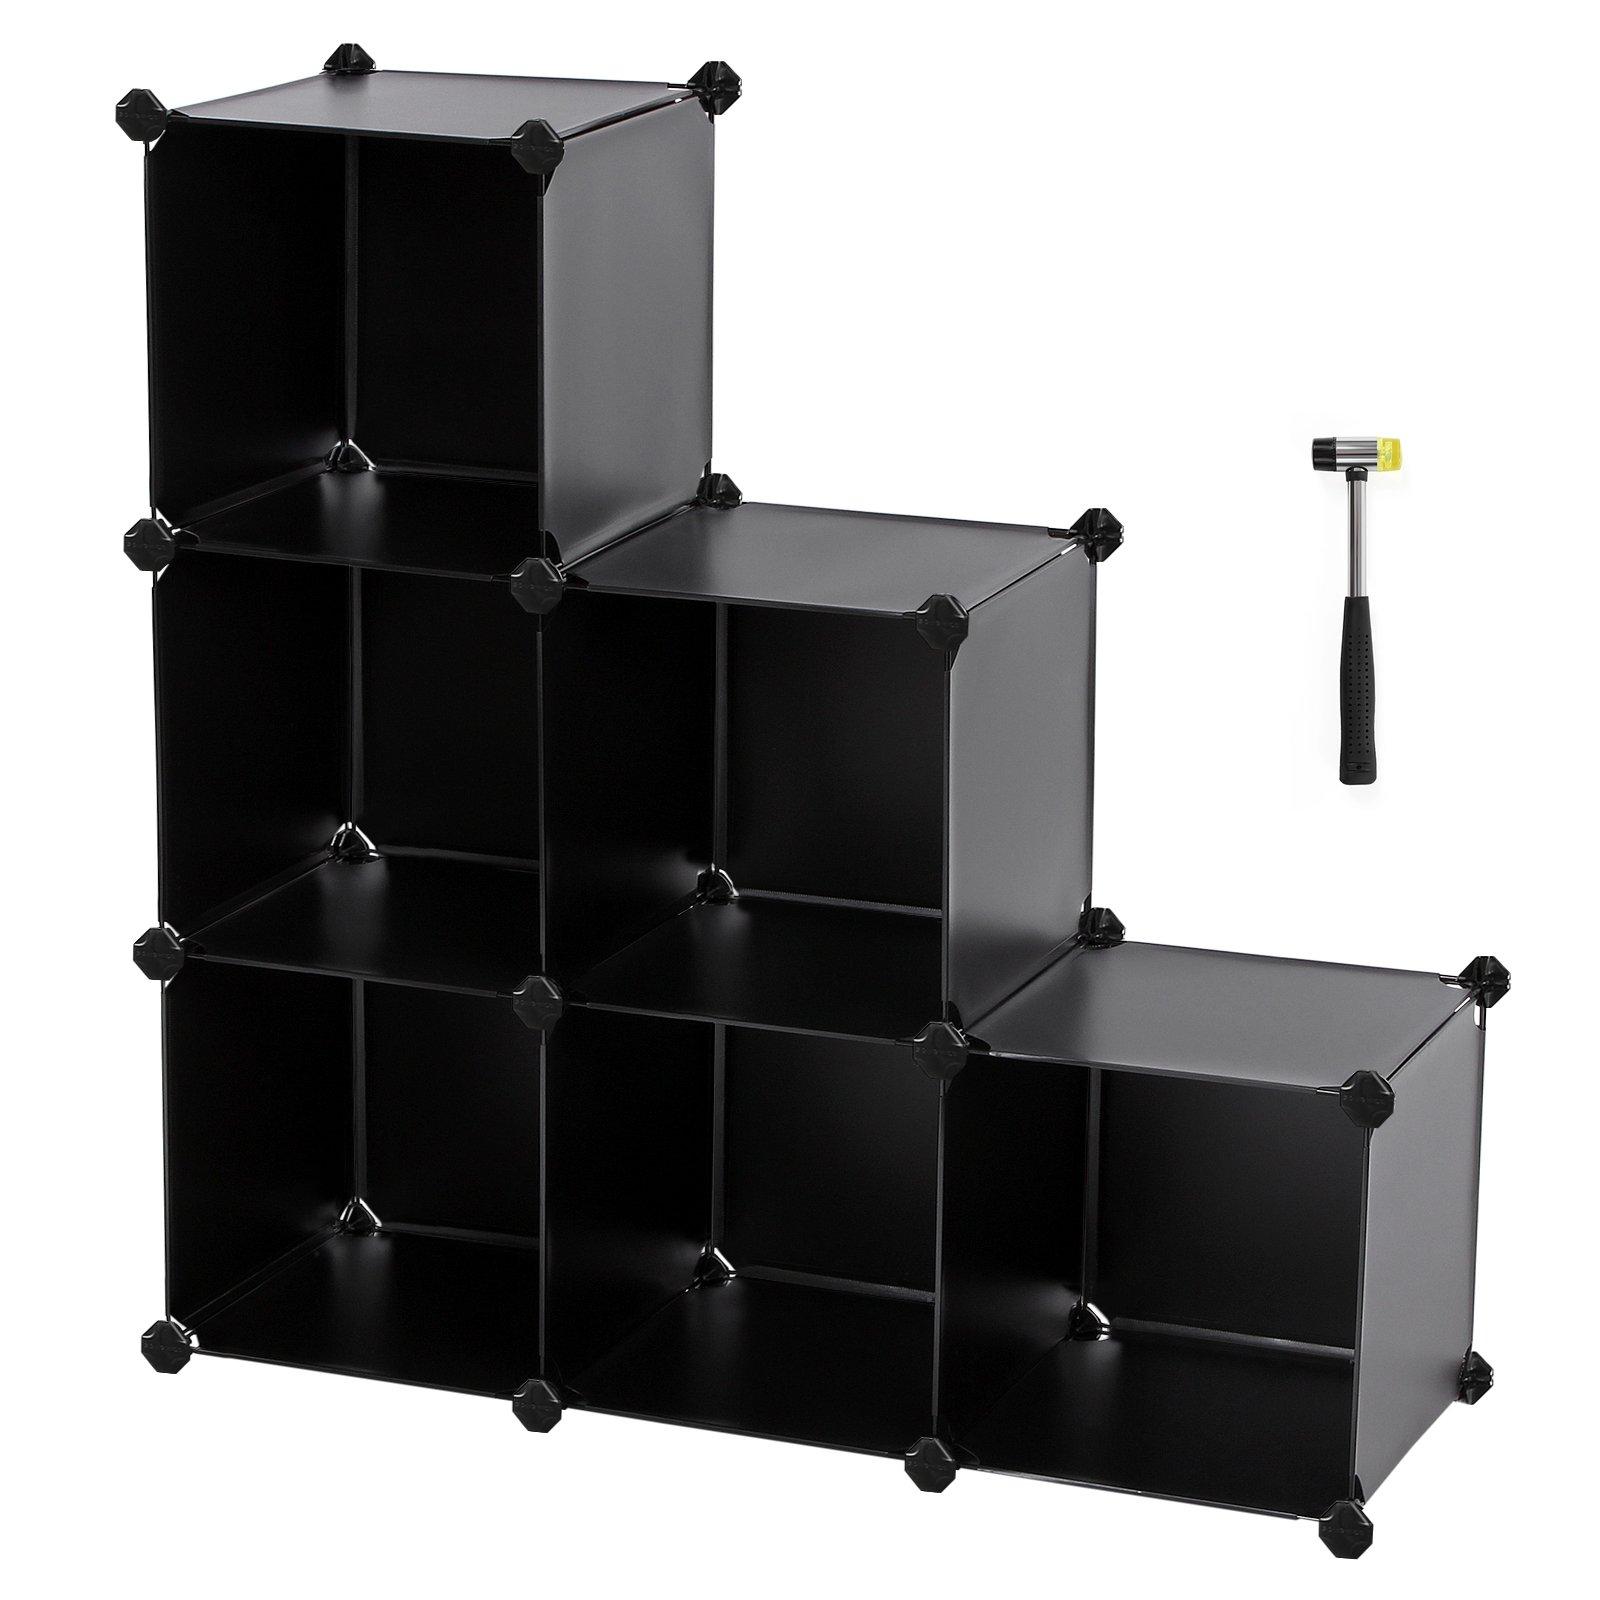 SONGMICS Cube Storage Organizer, 6-Cube Closet Storage Shelves, DIY Plastic Closet Cabinet, Modular Bookcase, Storage Shelving for Bedroom, Living room, Office, Black with Rubber Hammer Black ULPC06H